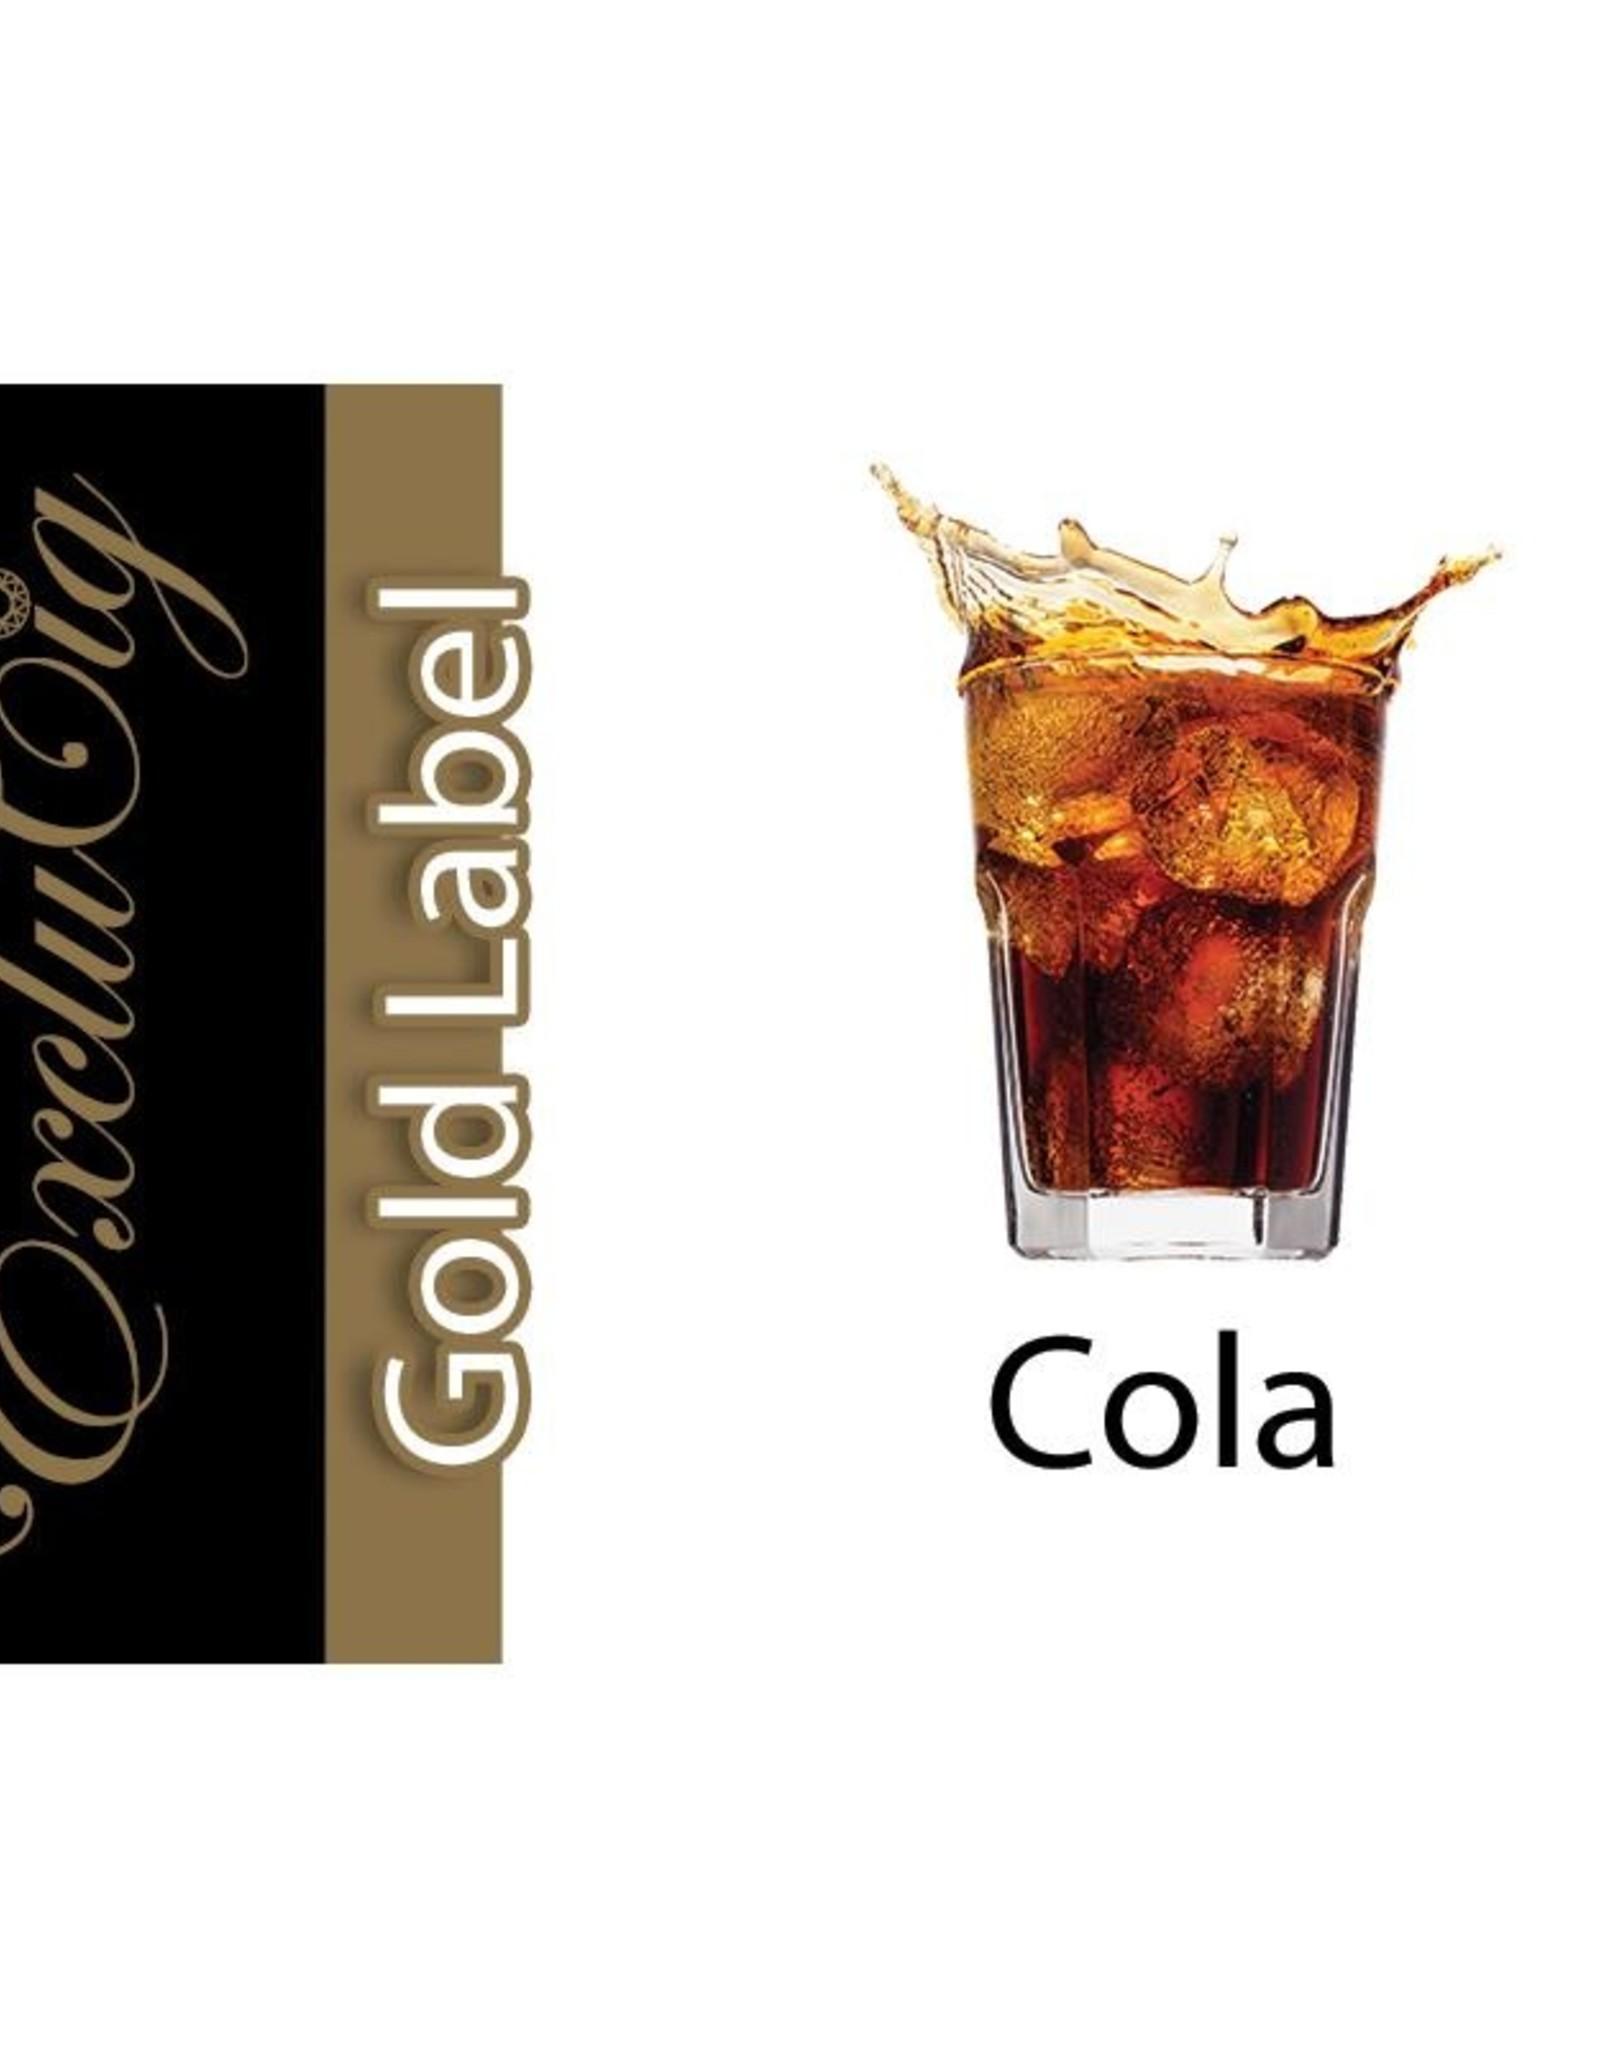 Exclucig Exclucig Gold Label E-liquid Cola 18 mg Nicotine